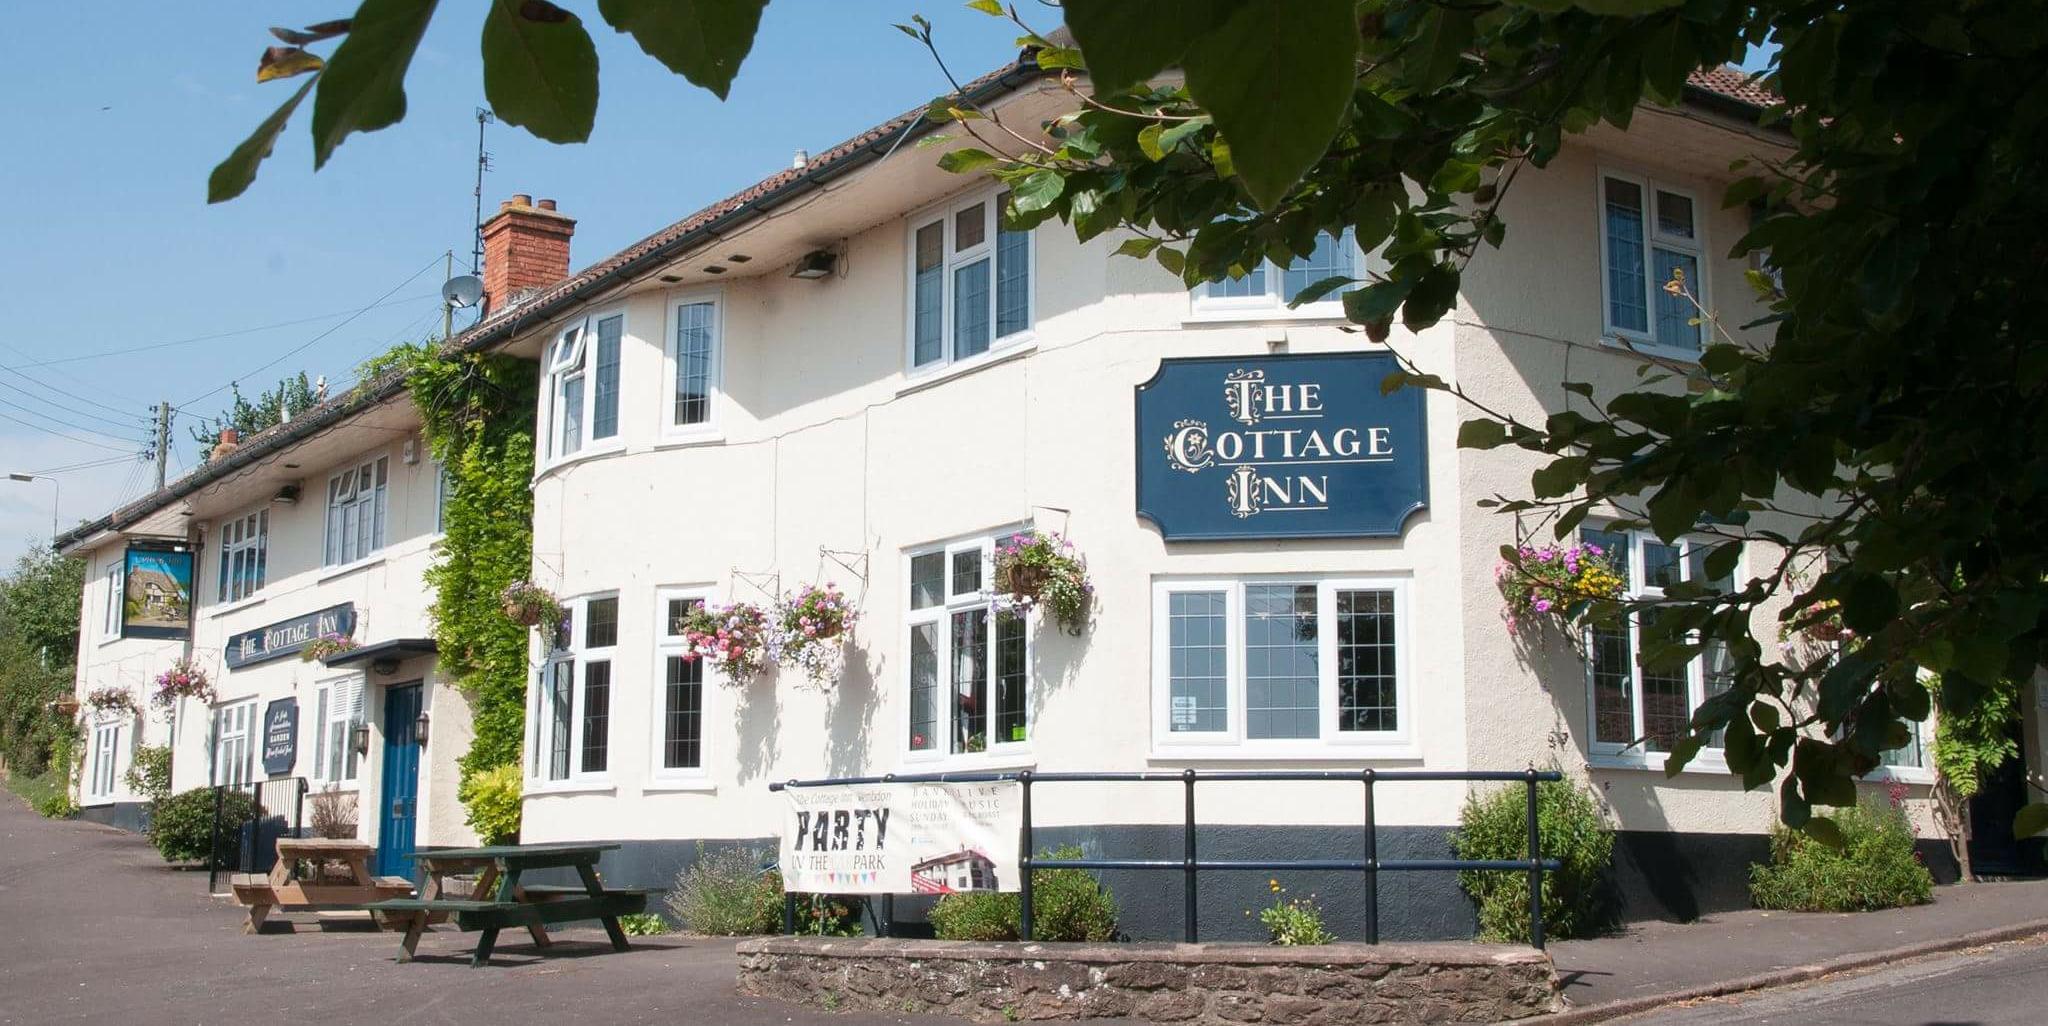 The Cottage Inn Wembdon